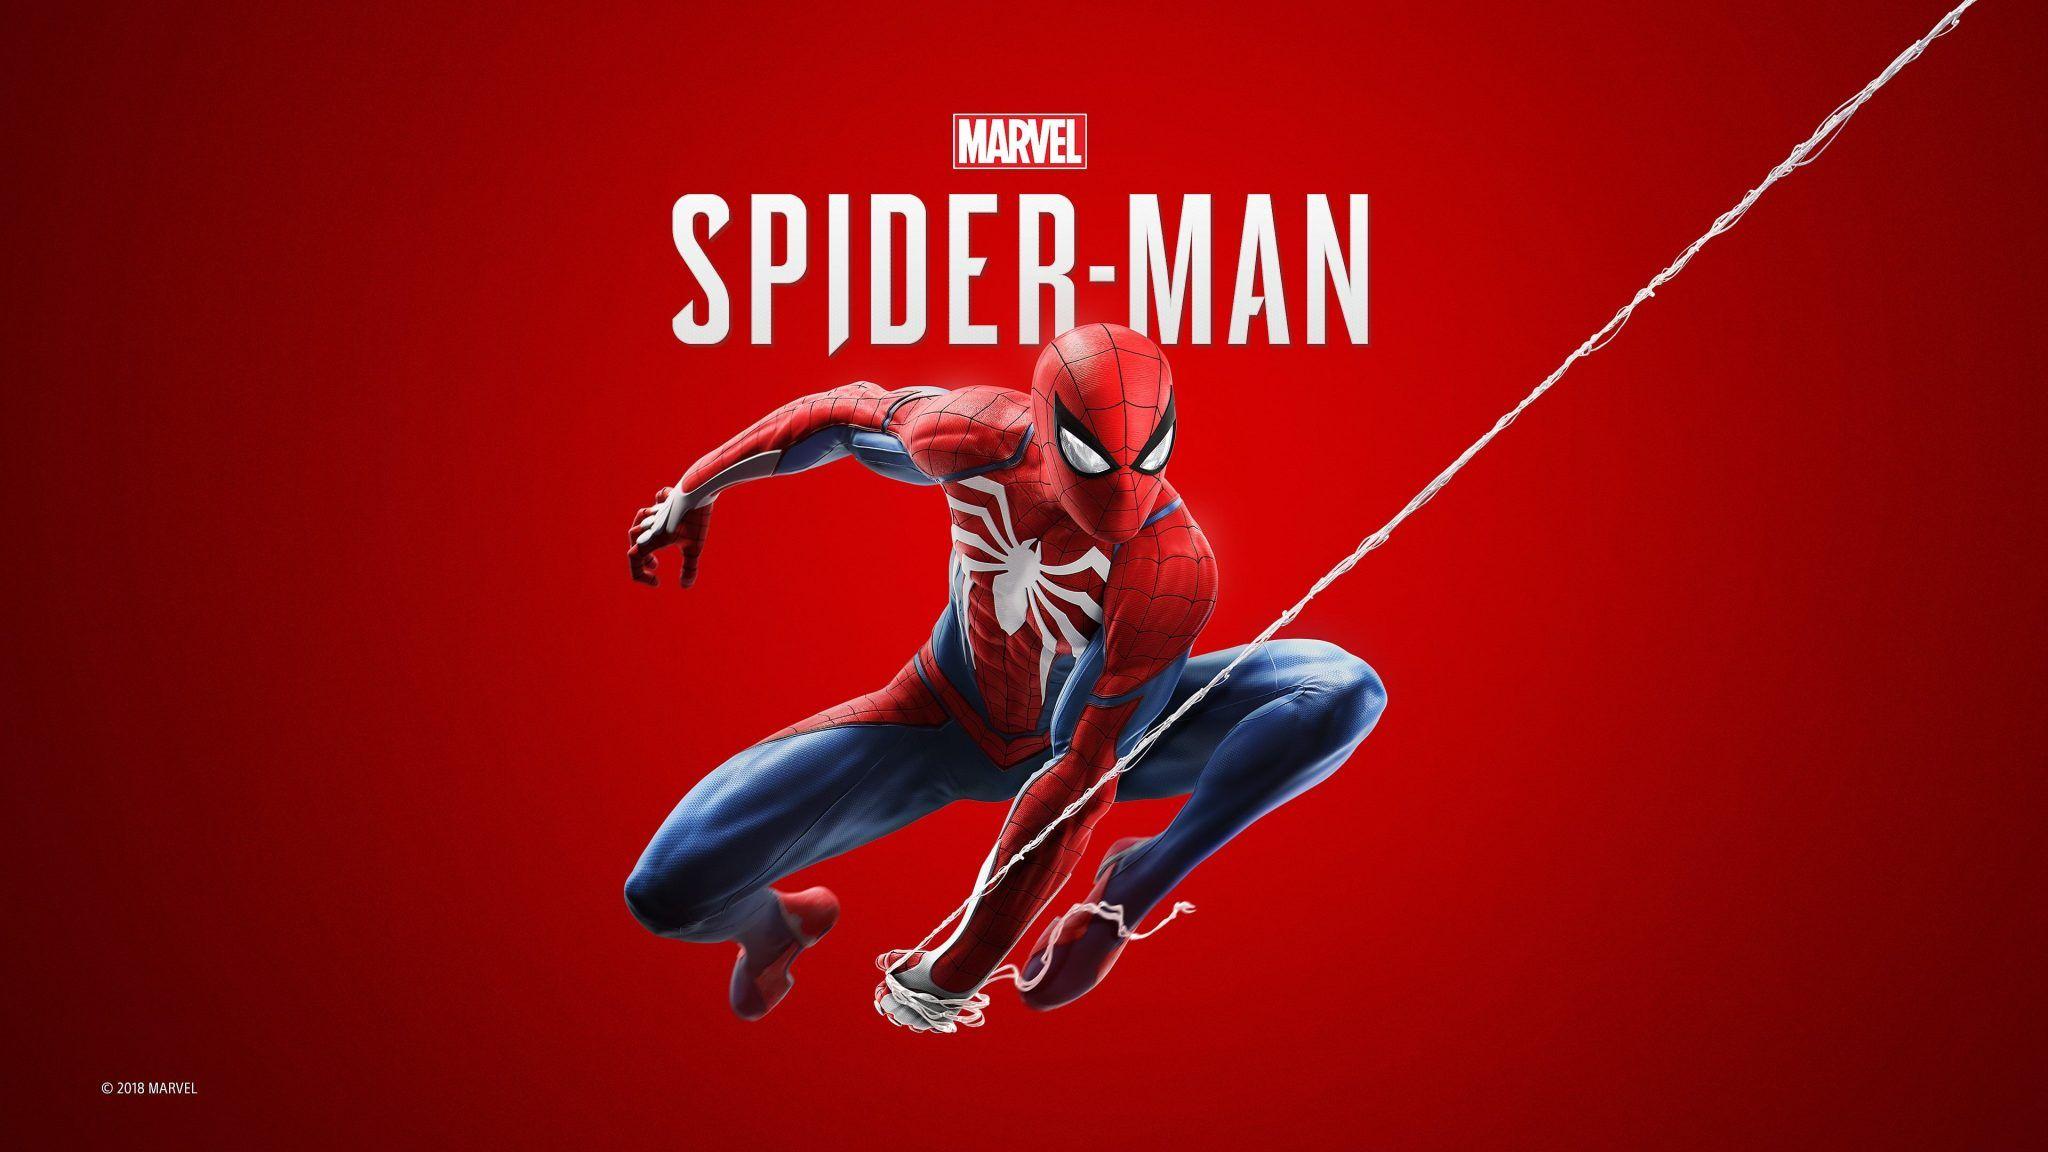 Christmas Offer Get Marvels Spider Man Ps4 Version Full Game Free Download 2019 Marvel Spiderman Spiderman Spiderman Ps4